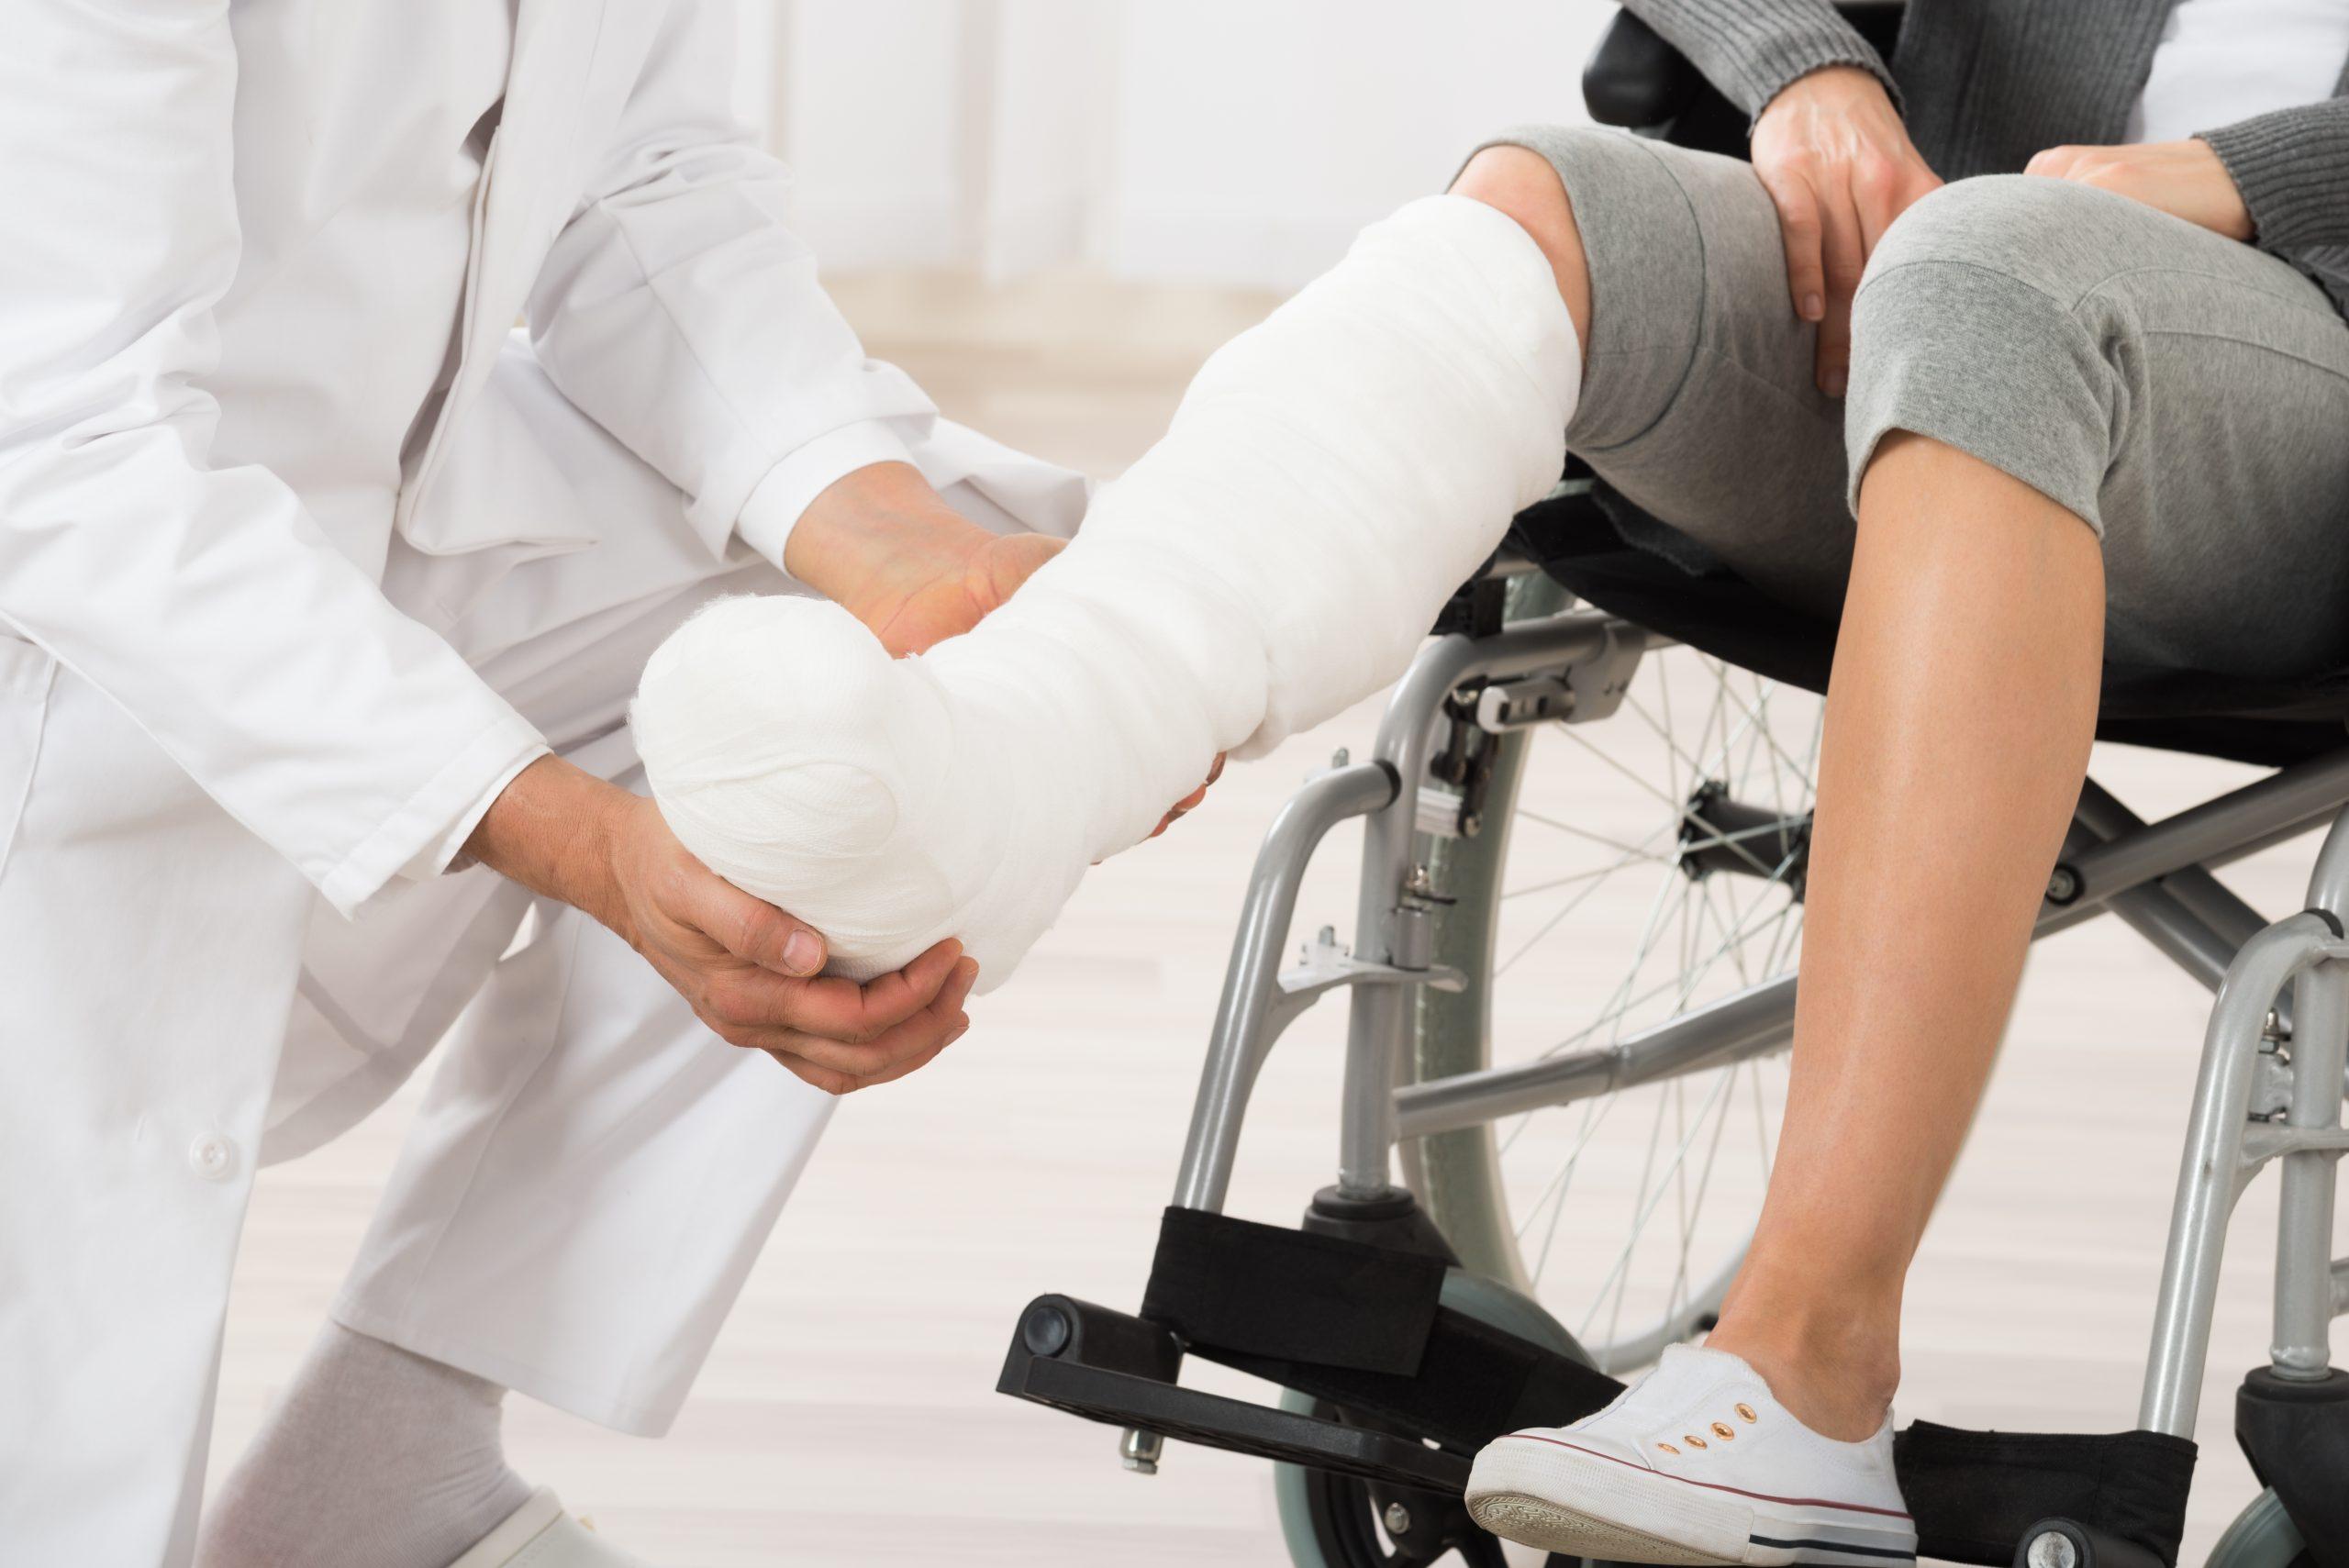 Broken bones serious injuries